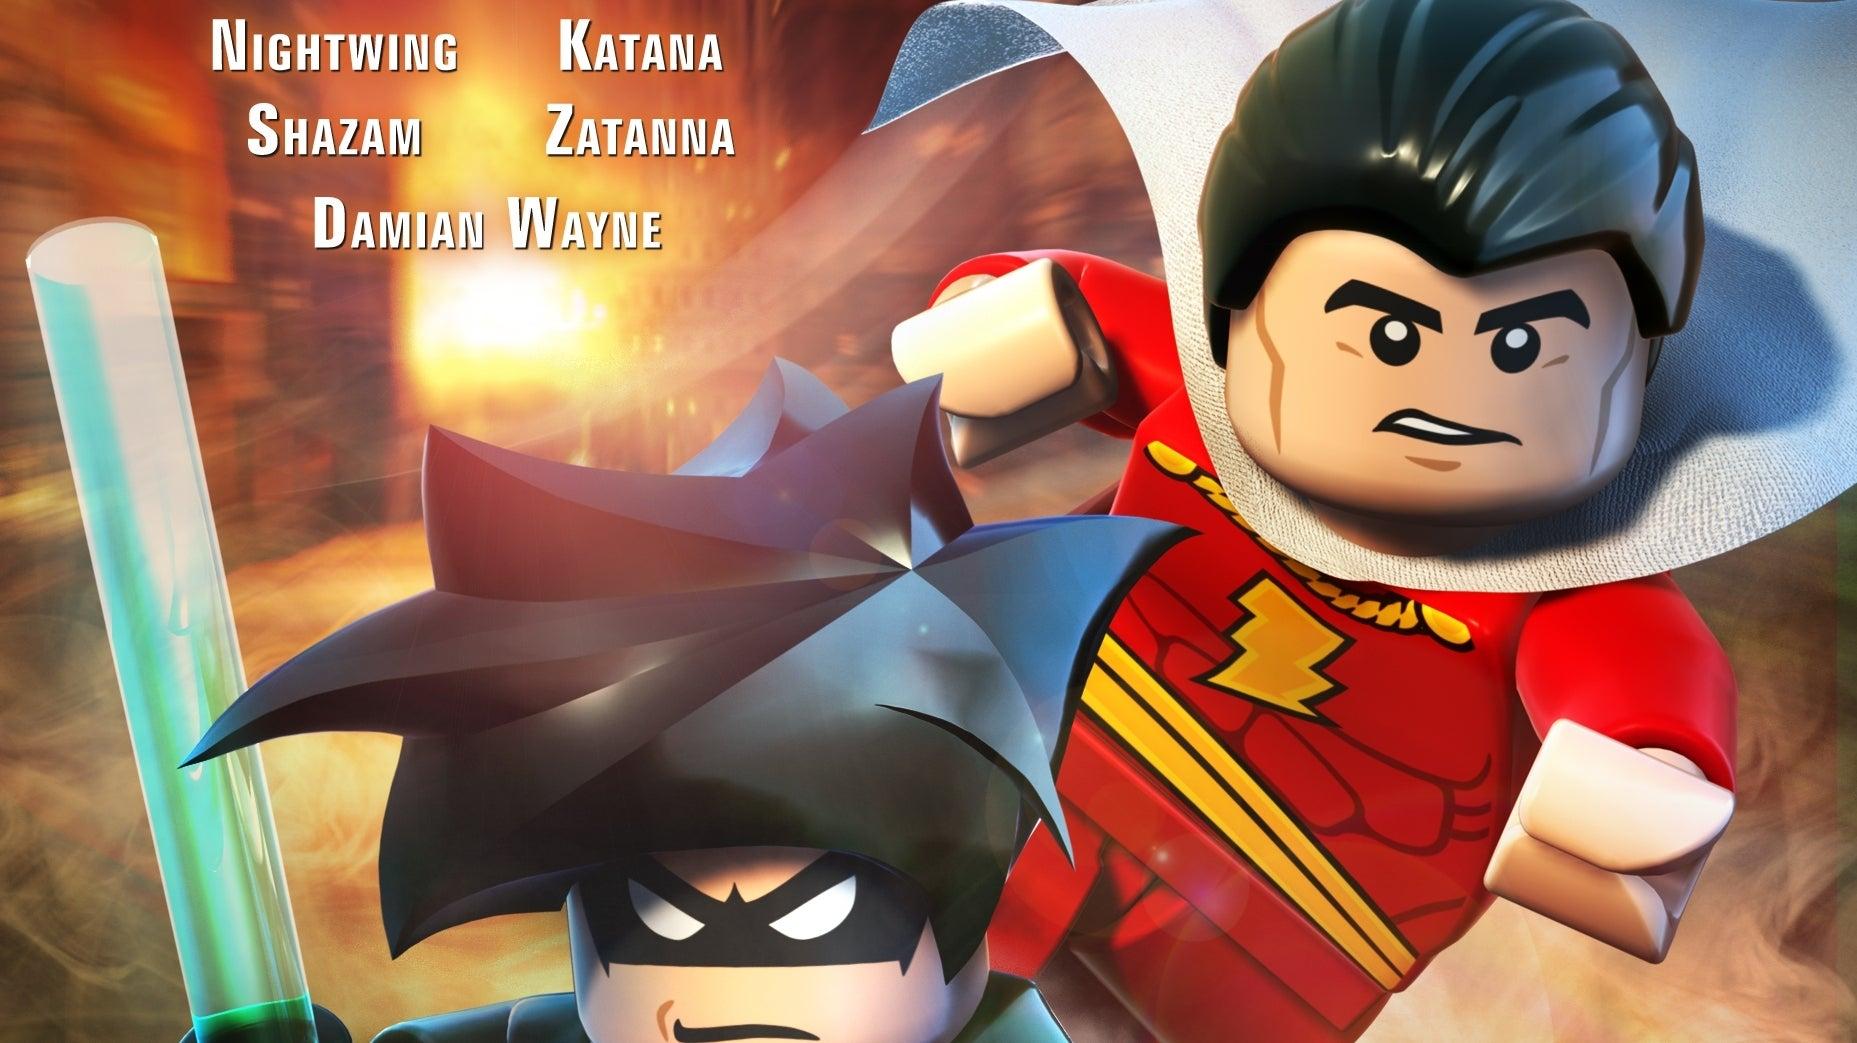 Nightwing, Bizarro and Zatanna Playable With Lego Batman 2 ...